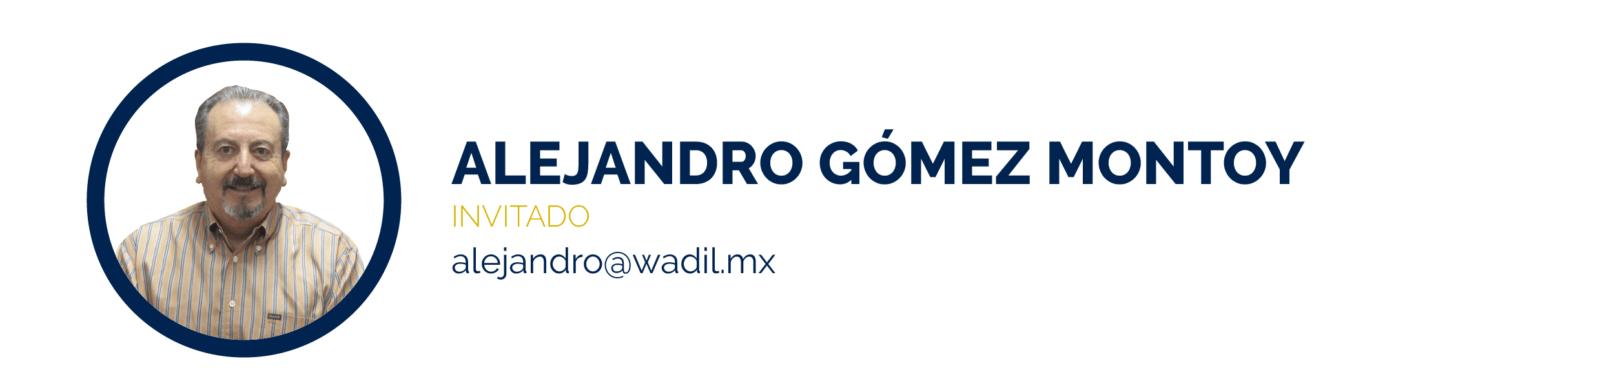 Alejandro-Gómez.png